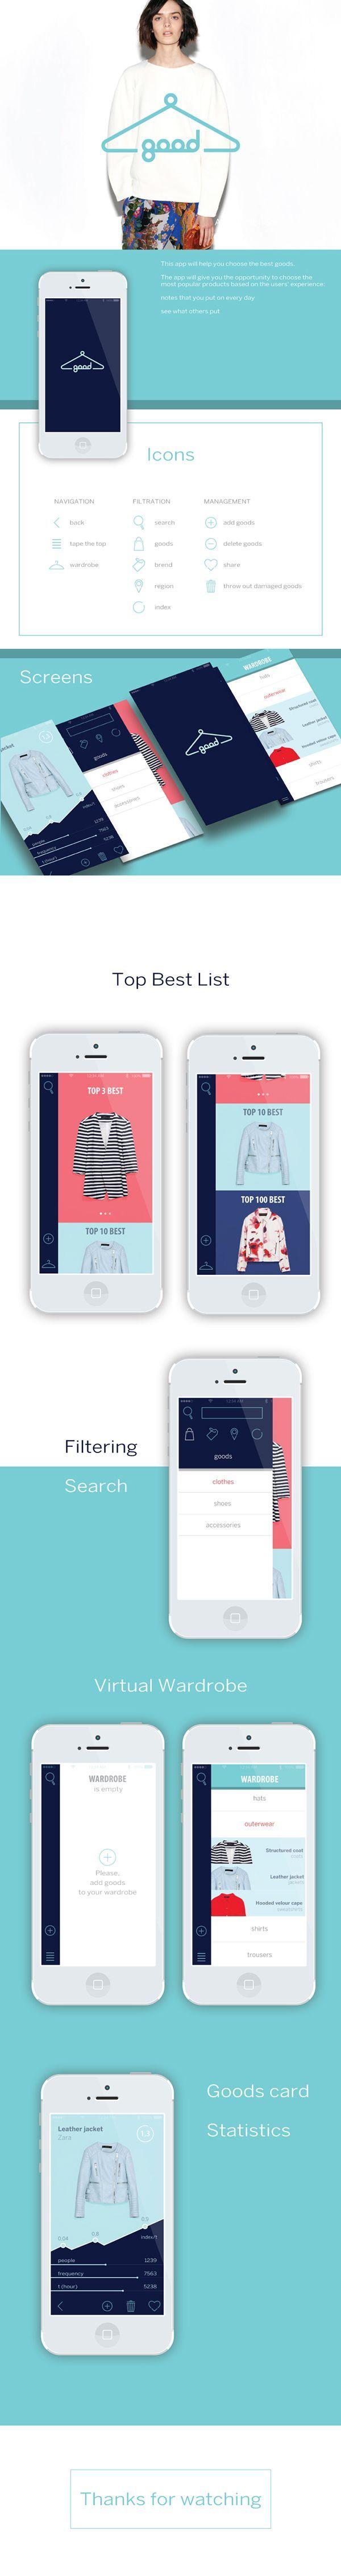 Iphone App GOODGOODS | Mobile | Pinterest